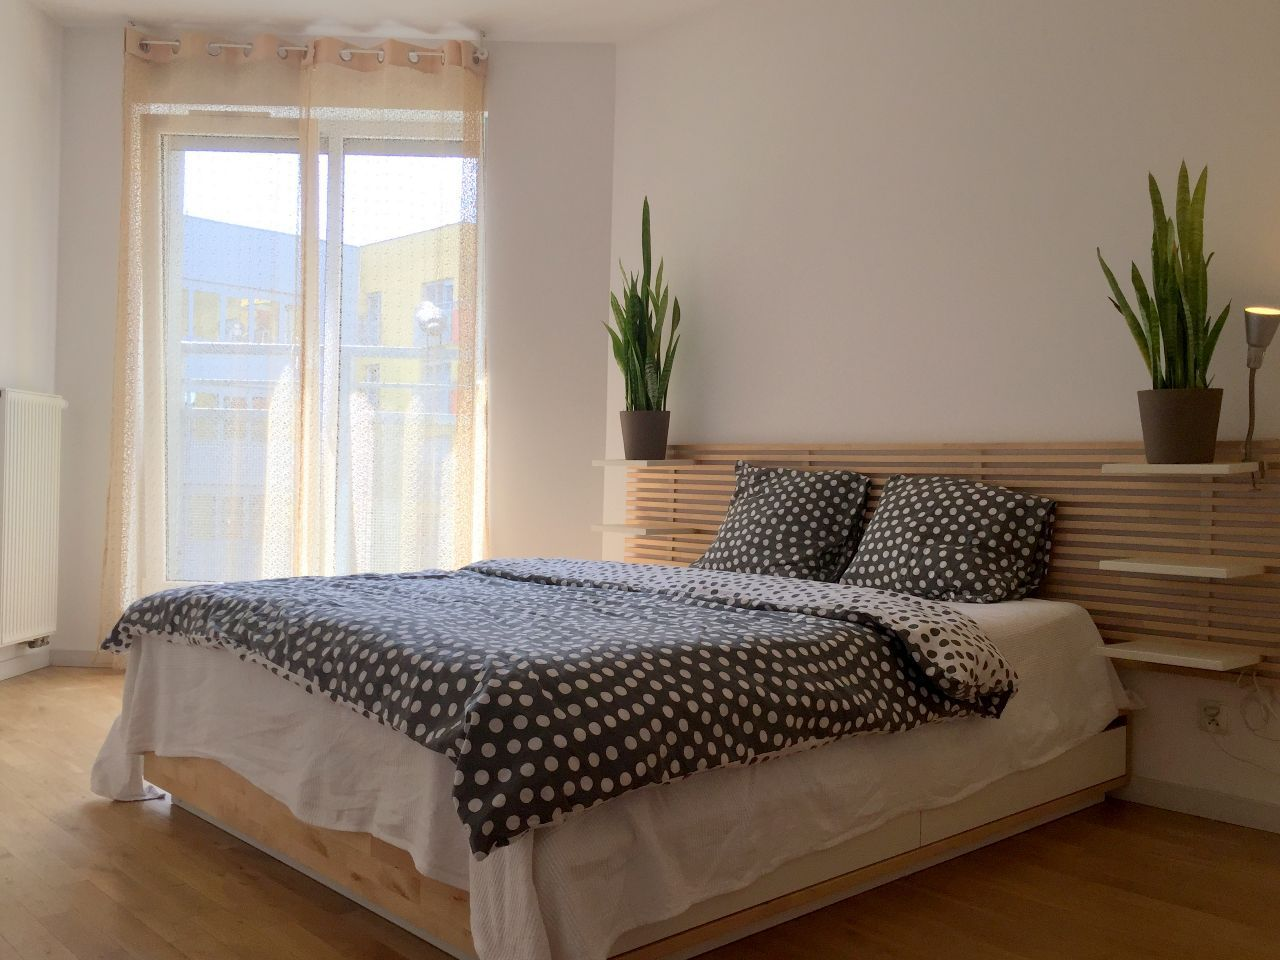 Квартира во Врославе 51 м2